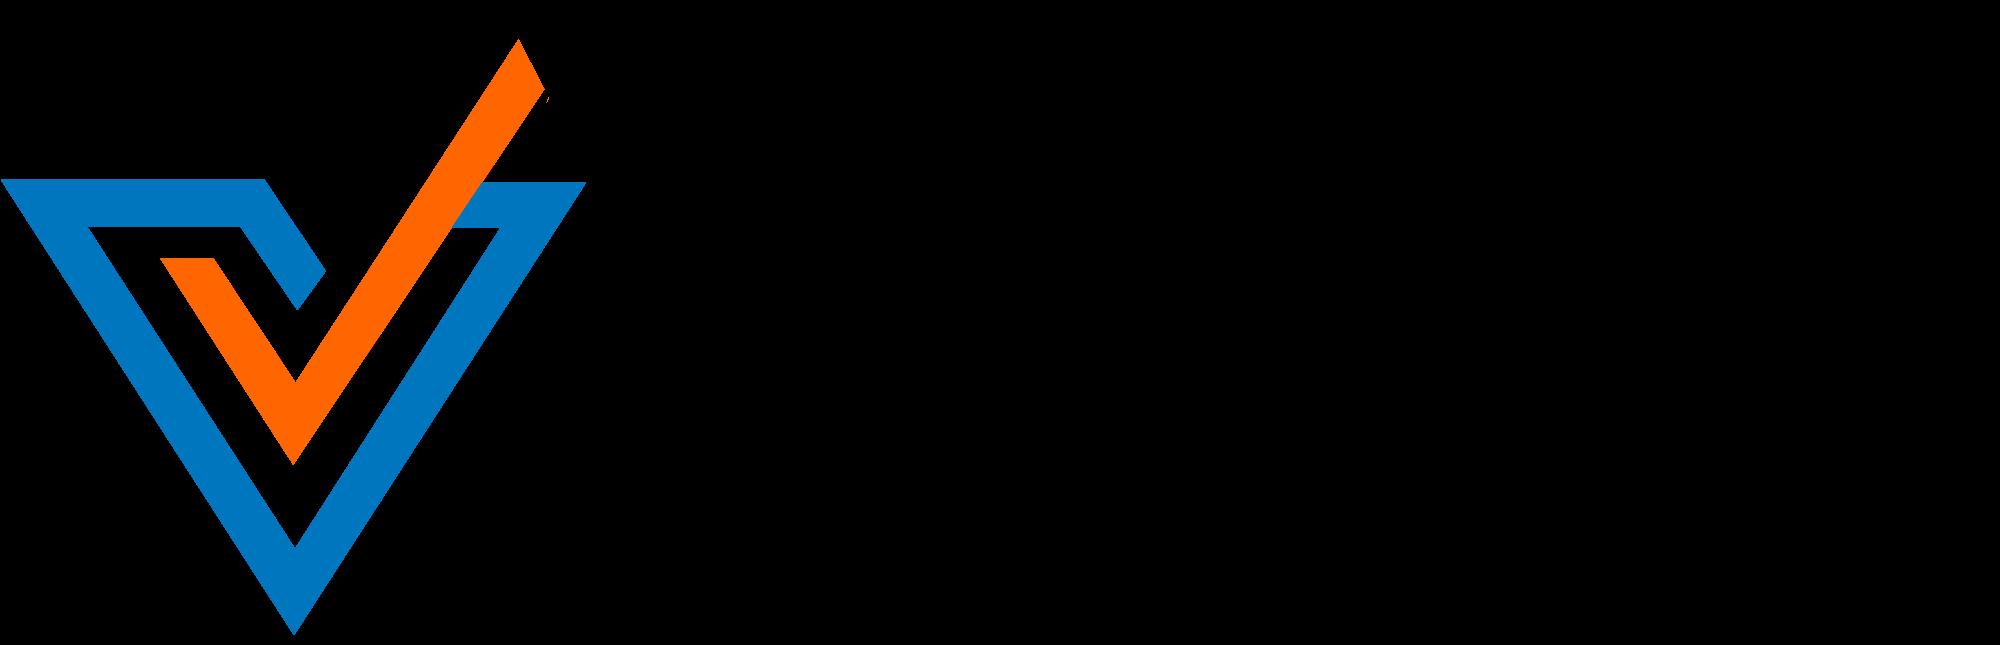 Logo%2ff0j6fqjqs1afzosjqizc vengreso horizontal final transparent bg